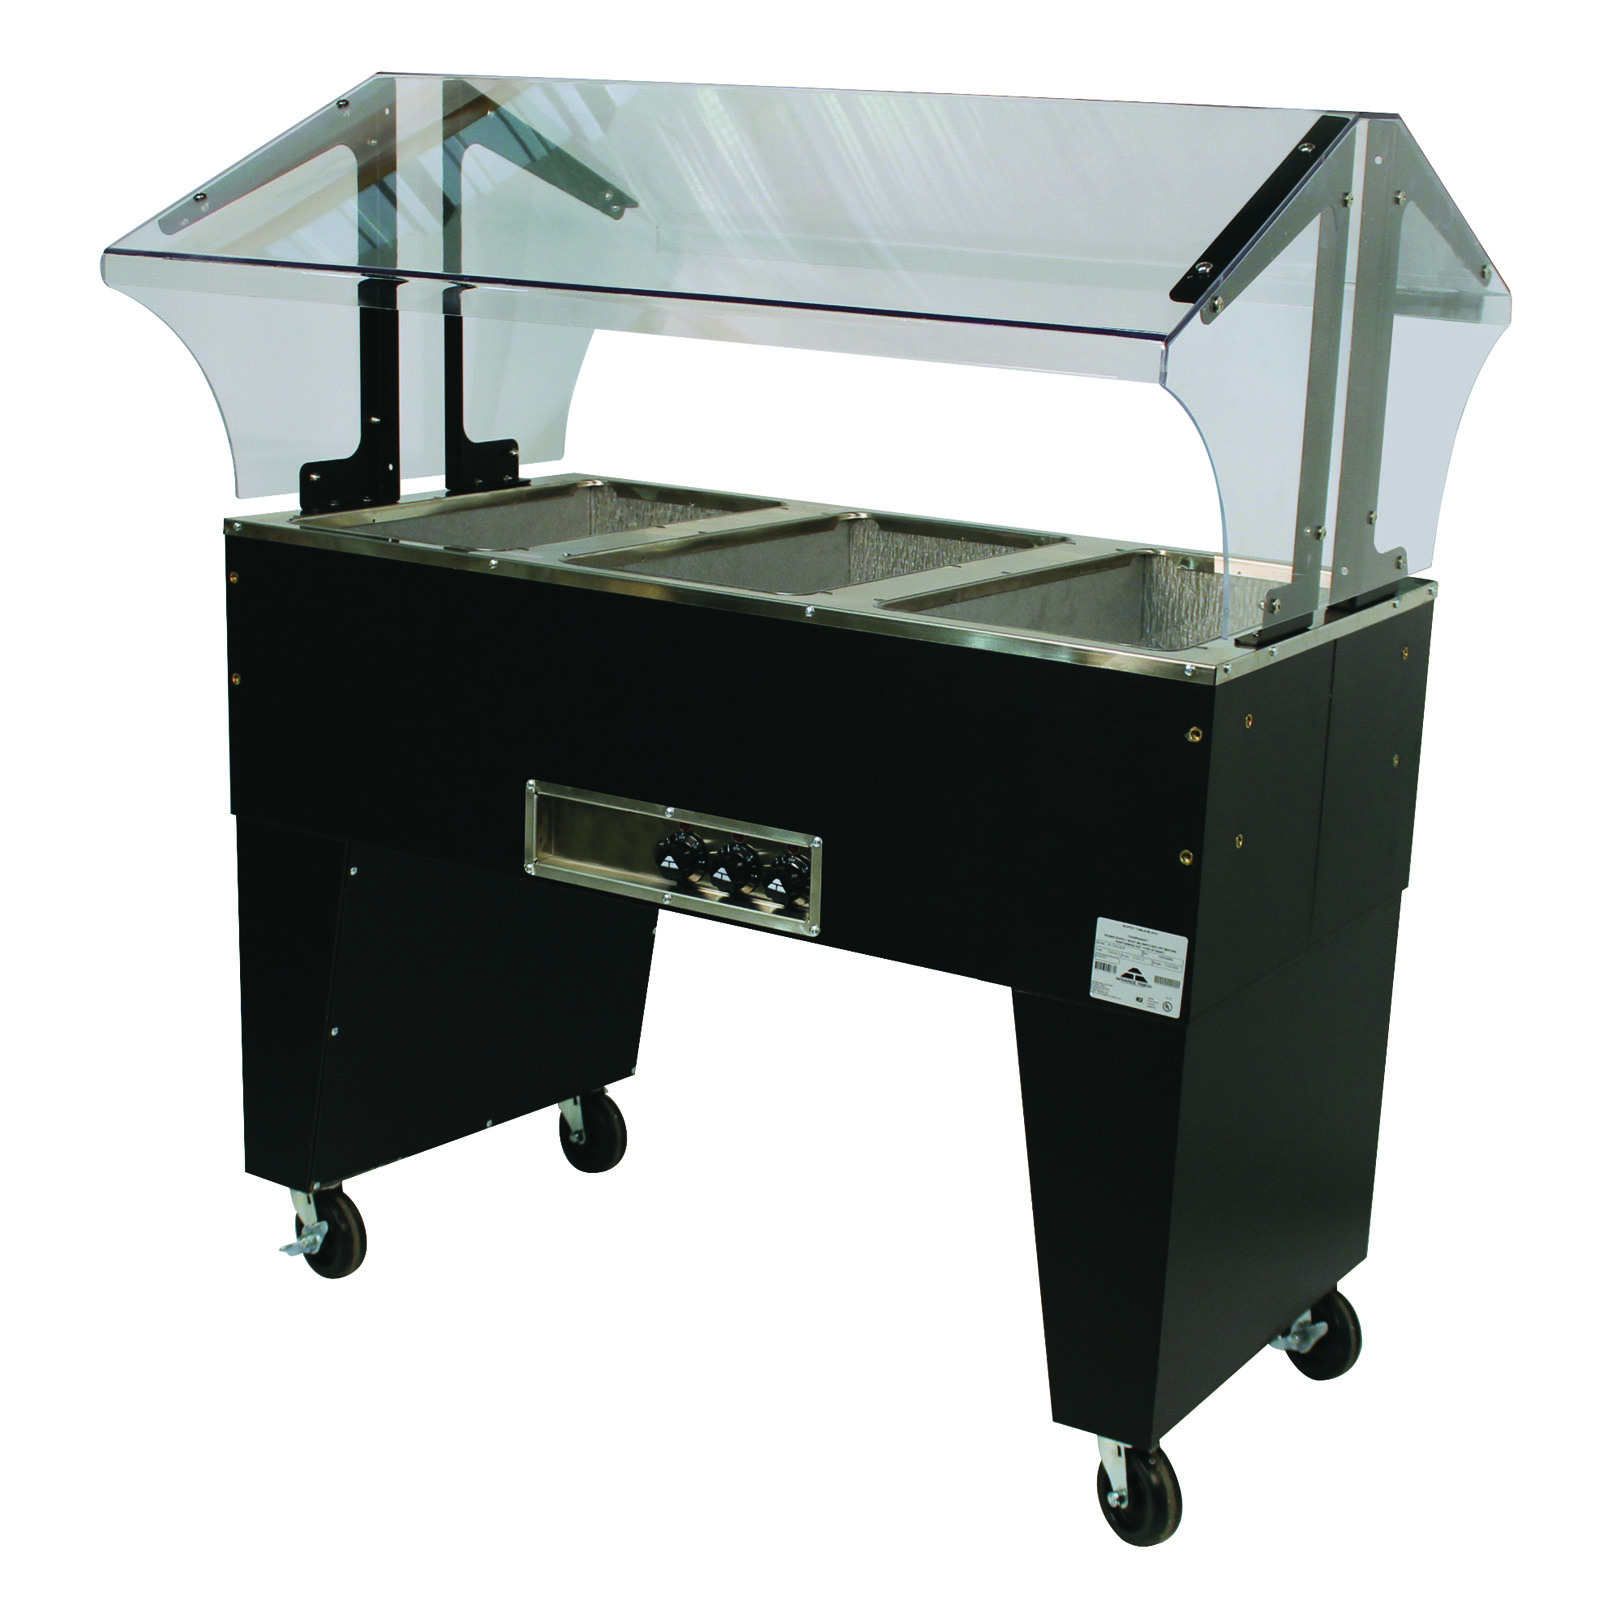 Advance Tabco B3-120-B-X serving counter, hot food, electric